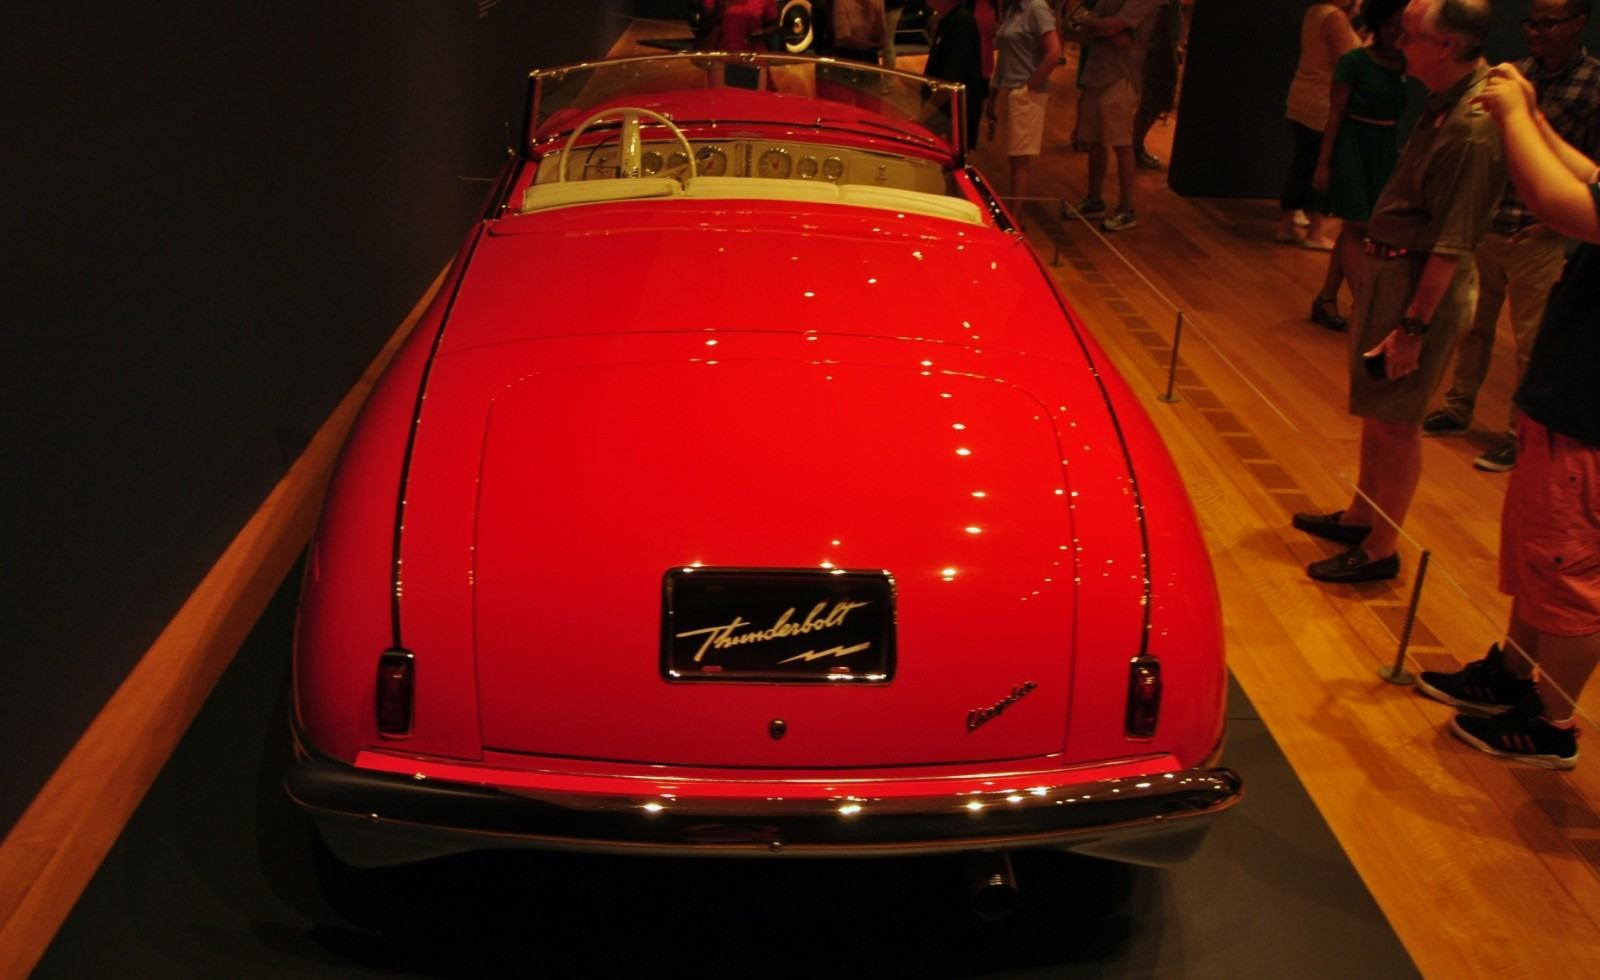 Atlanta Dream Cars Showcase - 1941 Chrysler Thunderbolt Is Aero Convertible Coupe 16